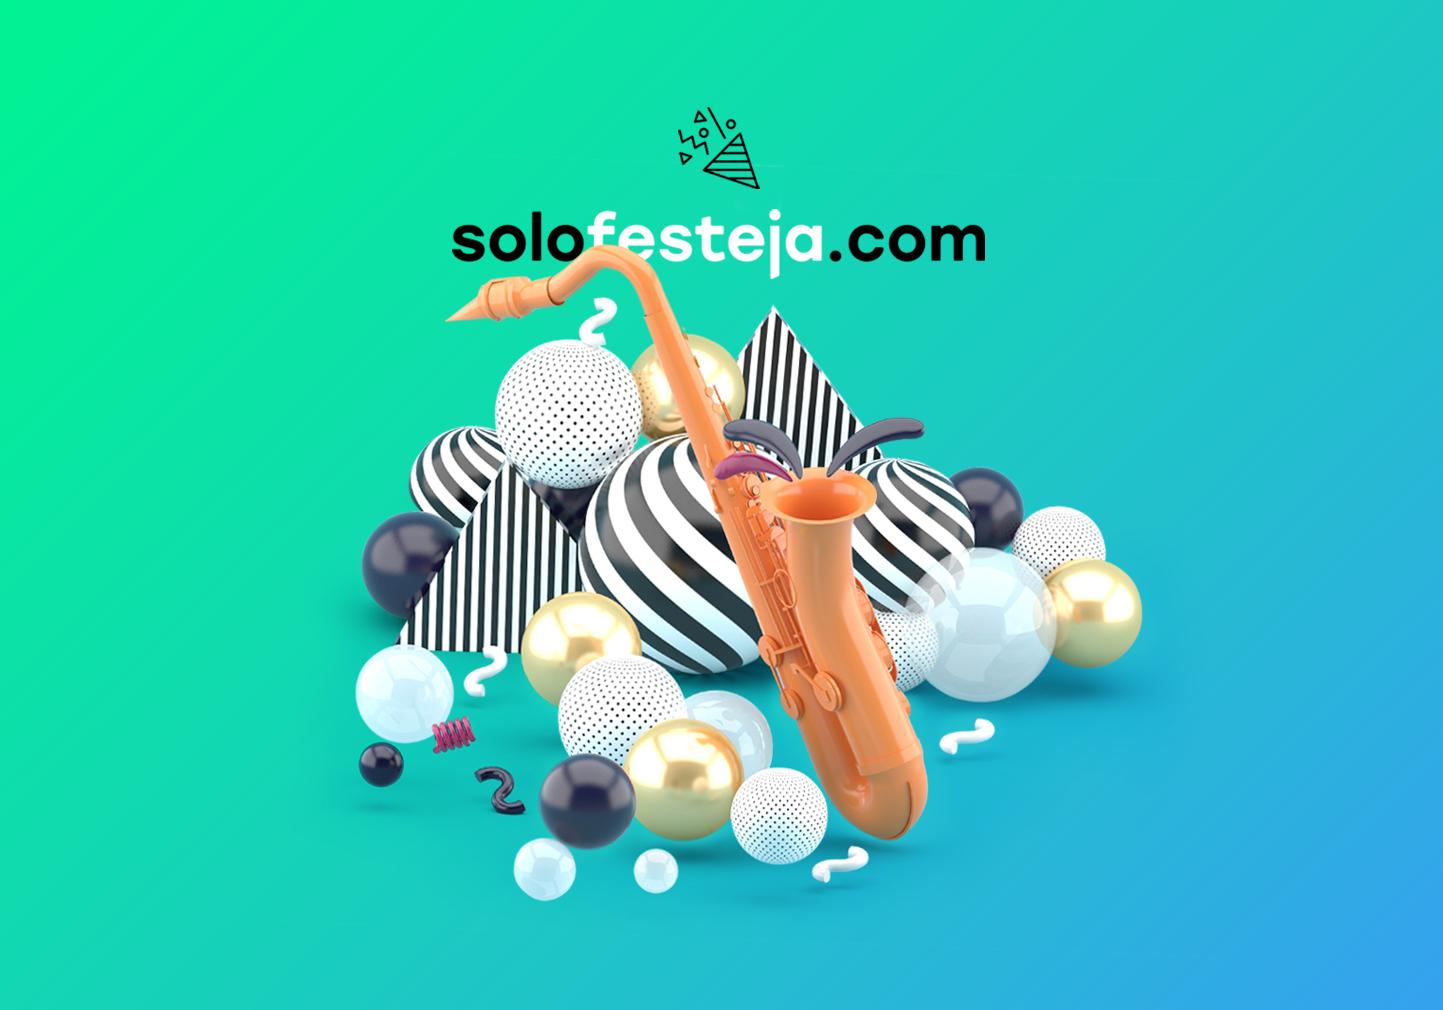 solofesteja.com